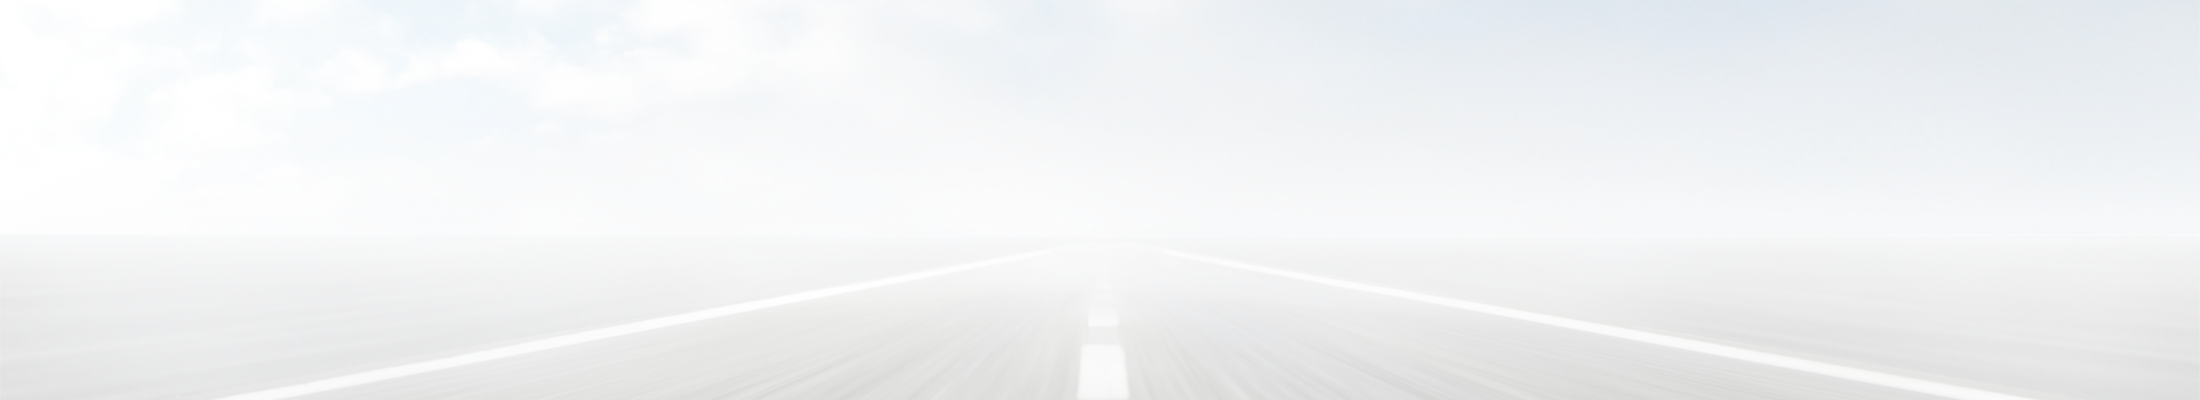 road_overlay2